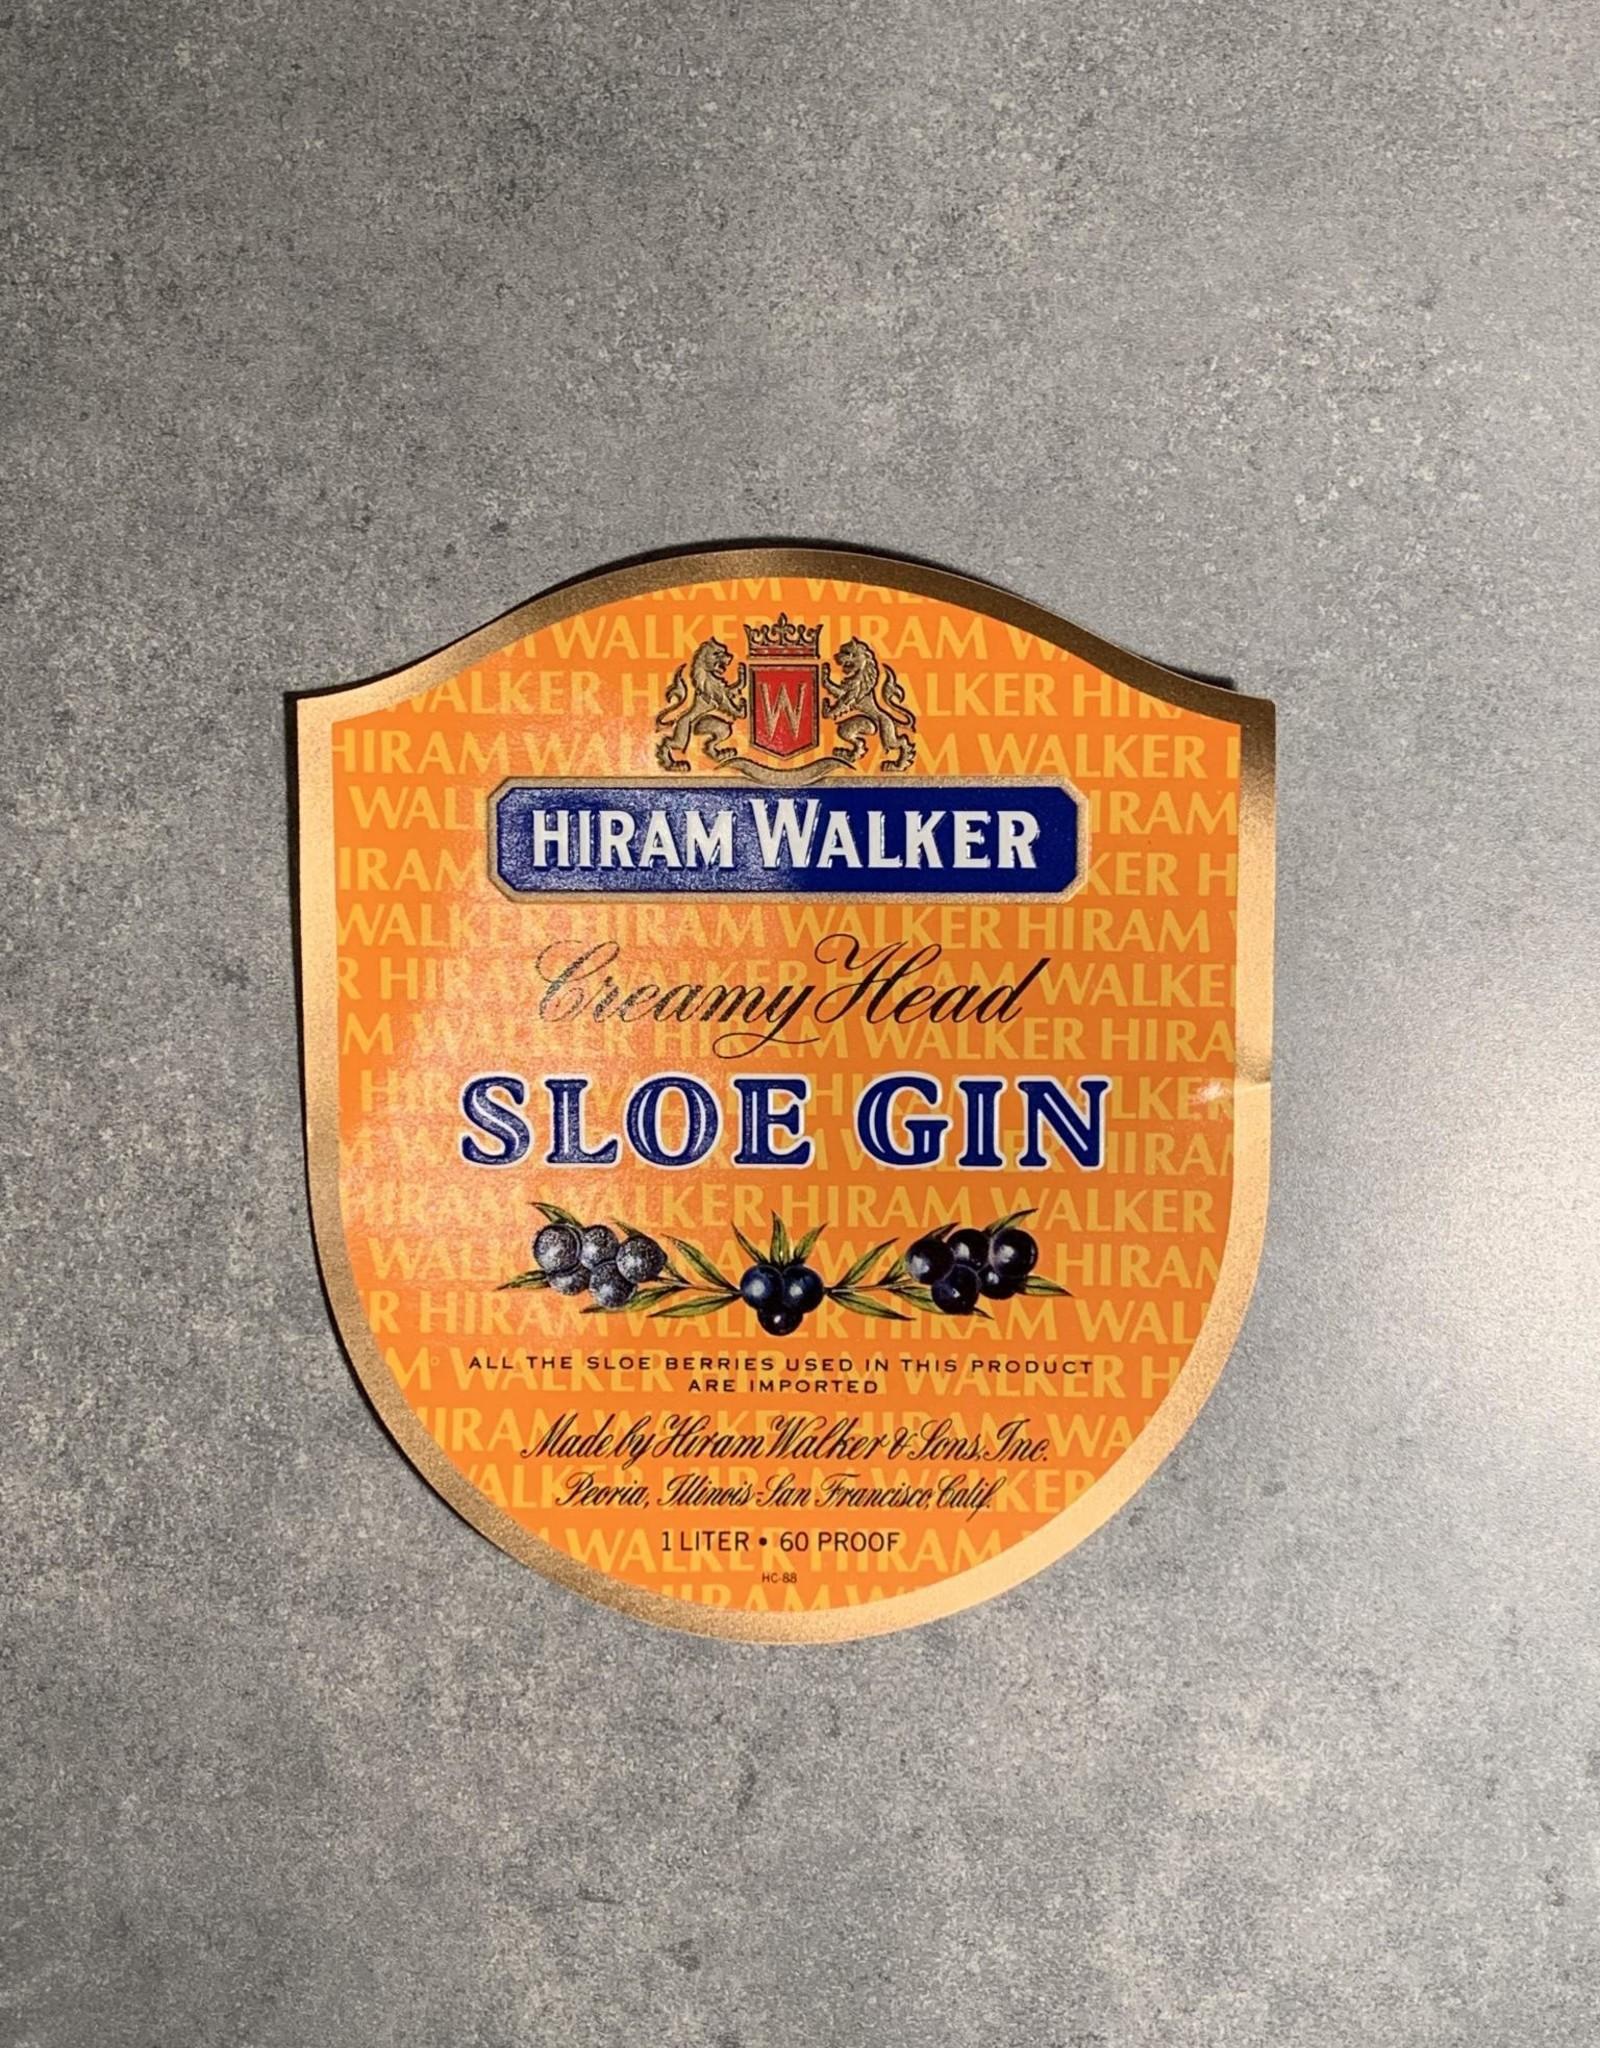 UA Merch Hiram Walker & Sons Peoria Il. Sloe Gin Label